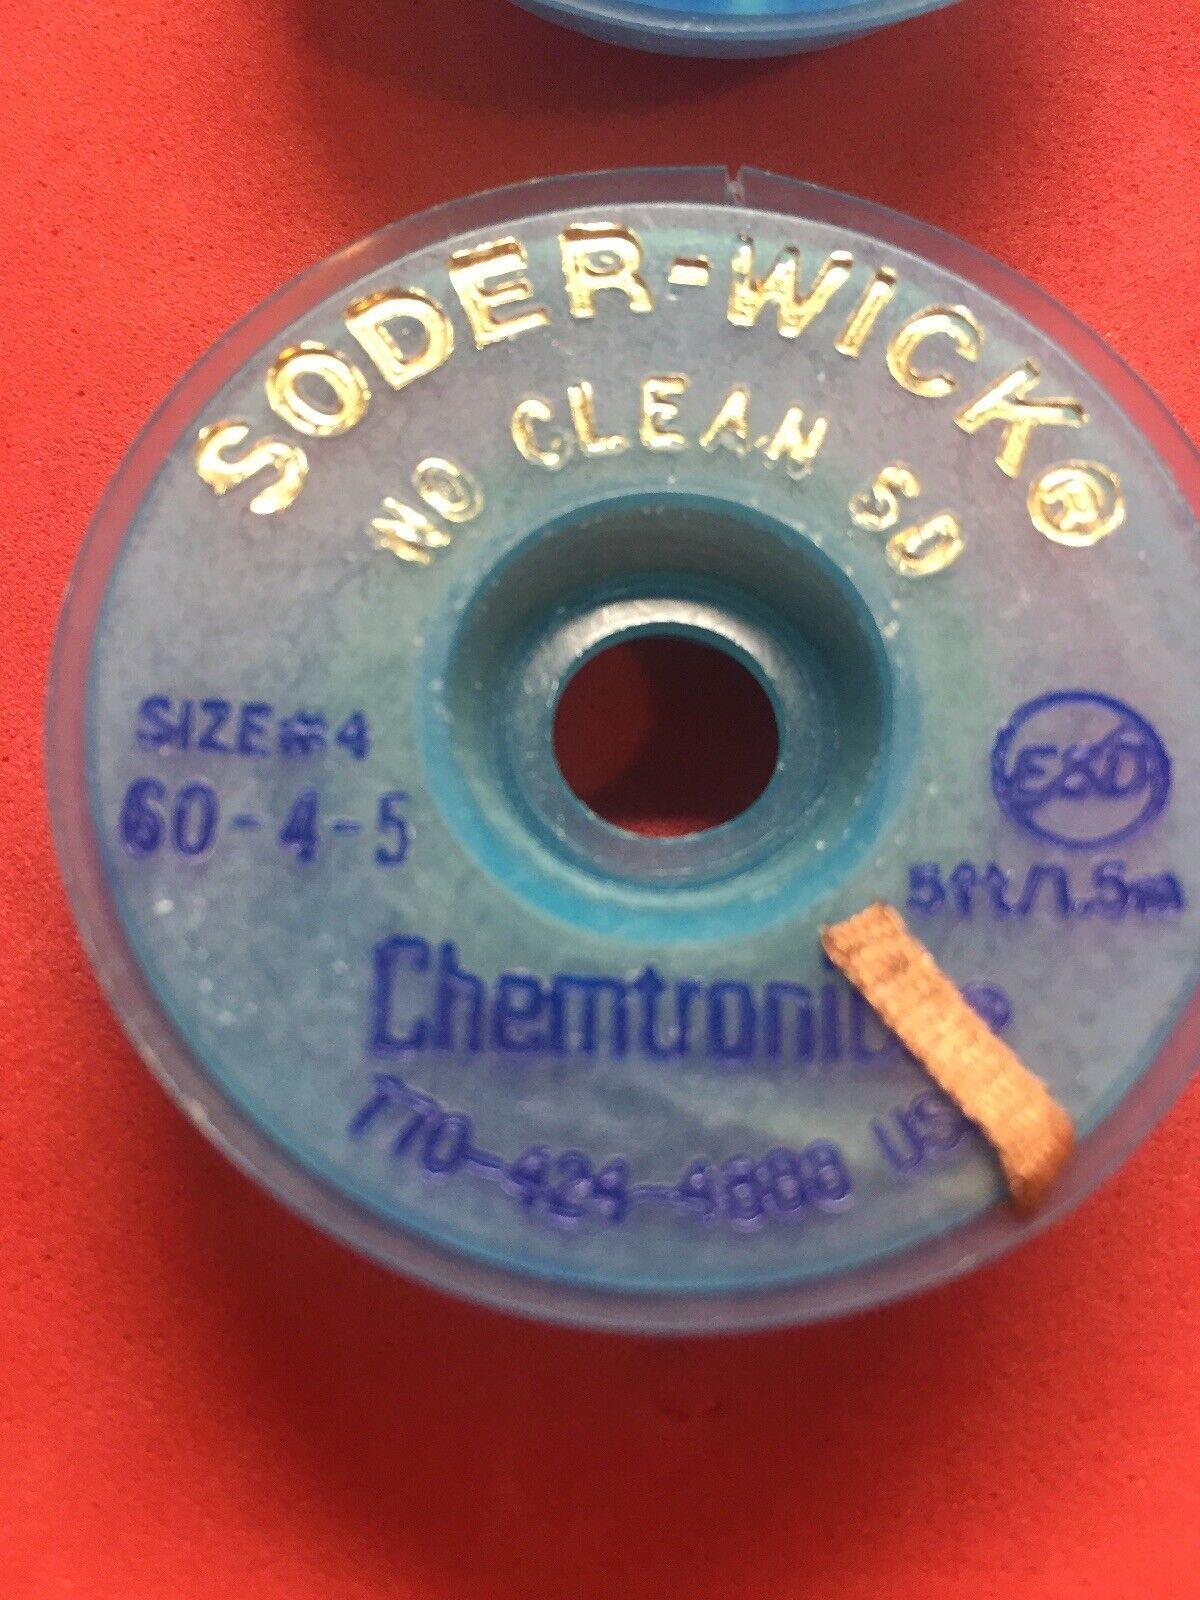 HH Chemtronics 10-5L Chem-Wik Rosin SD Desoldering Braid, 5 Pack of